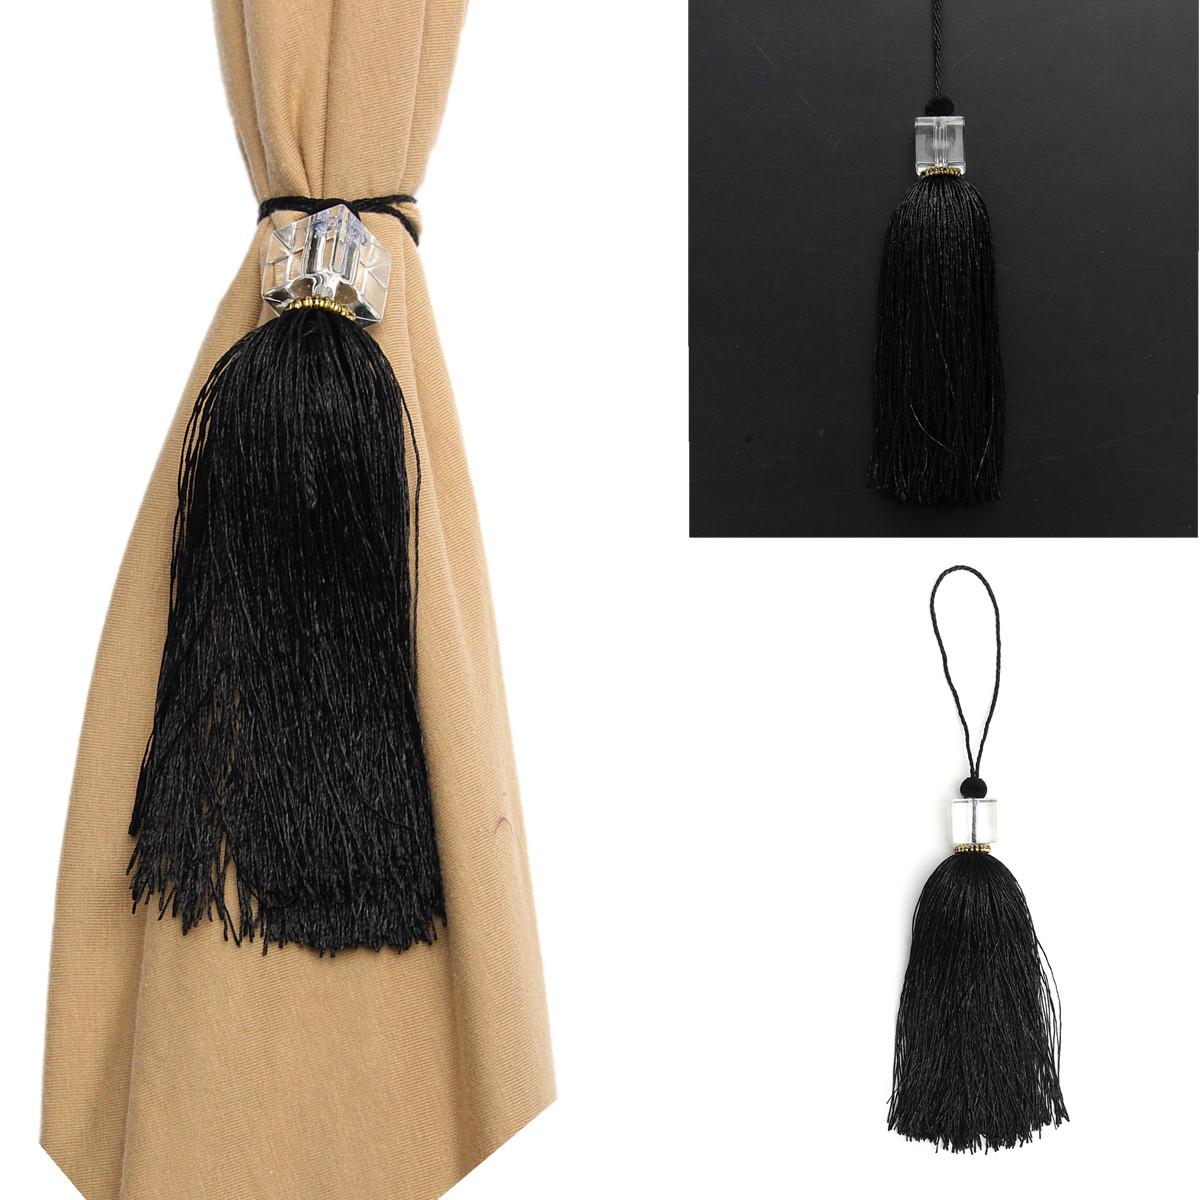 embrasse attache rideau pompon frang cristal perl pr maison chambre decoration ebay. Black Bedroom Furniture Sets. Home Design Ideas